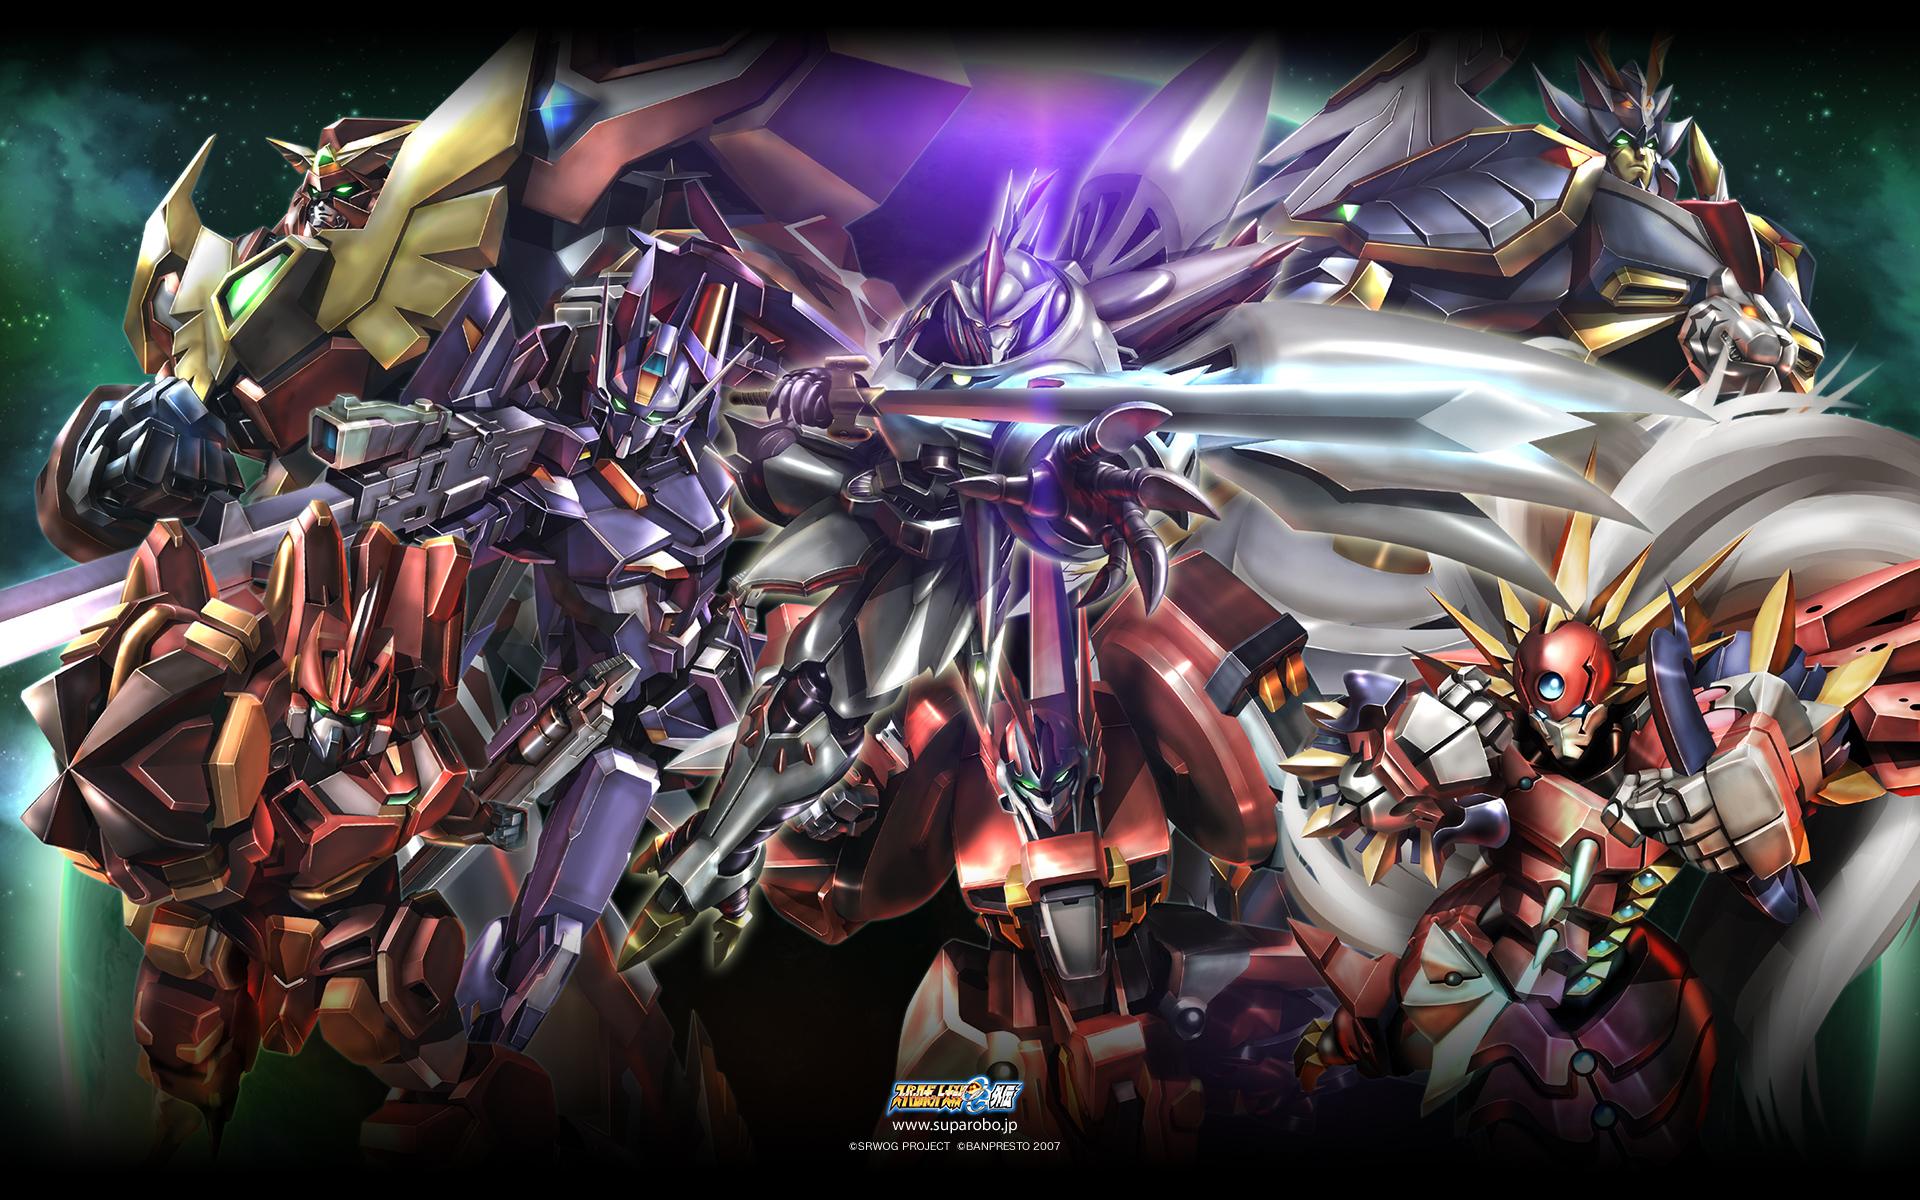 Super robot wars wallpaper zerochan anime image board - Anime war wallpaper ...